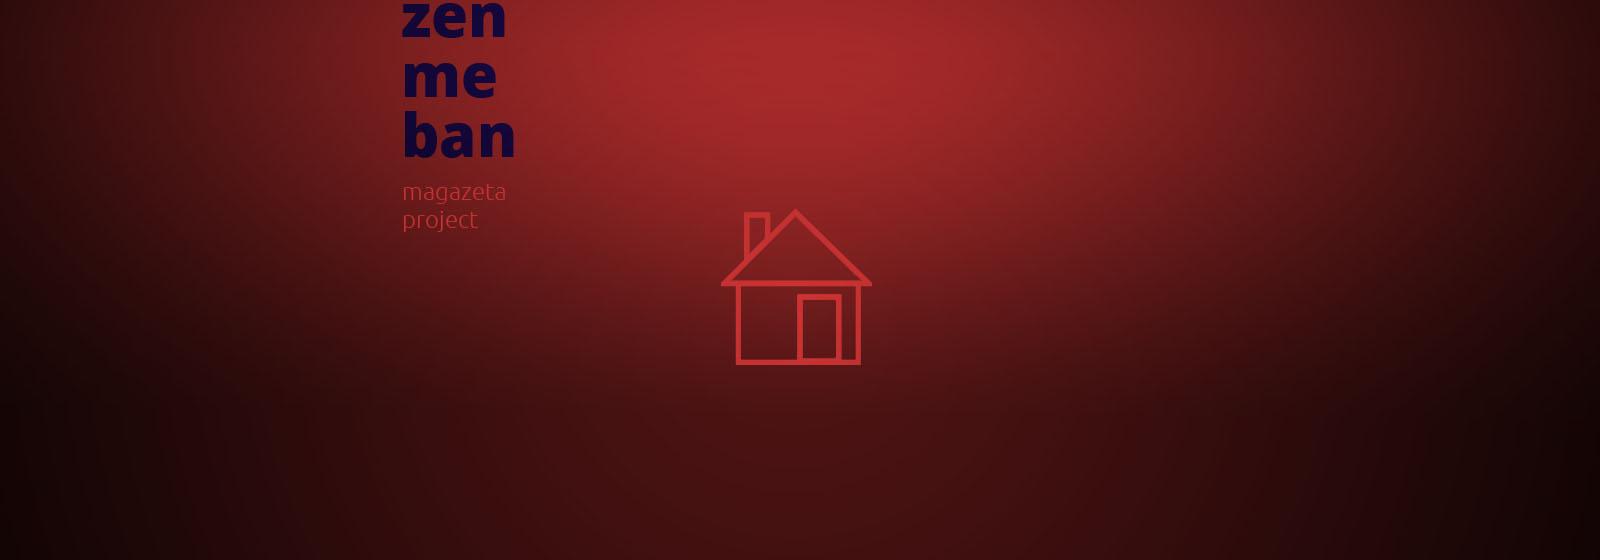 zenmeban_house